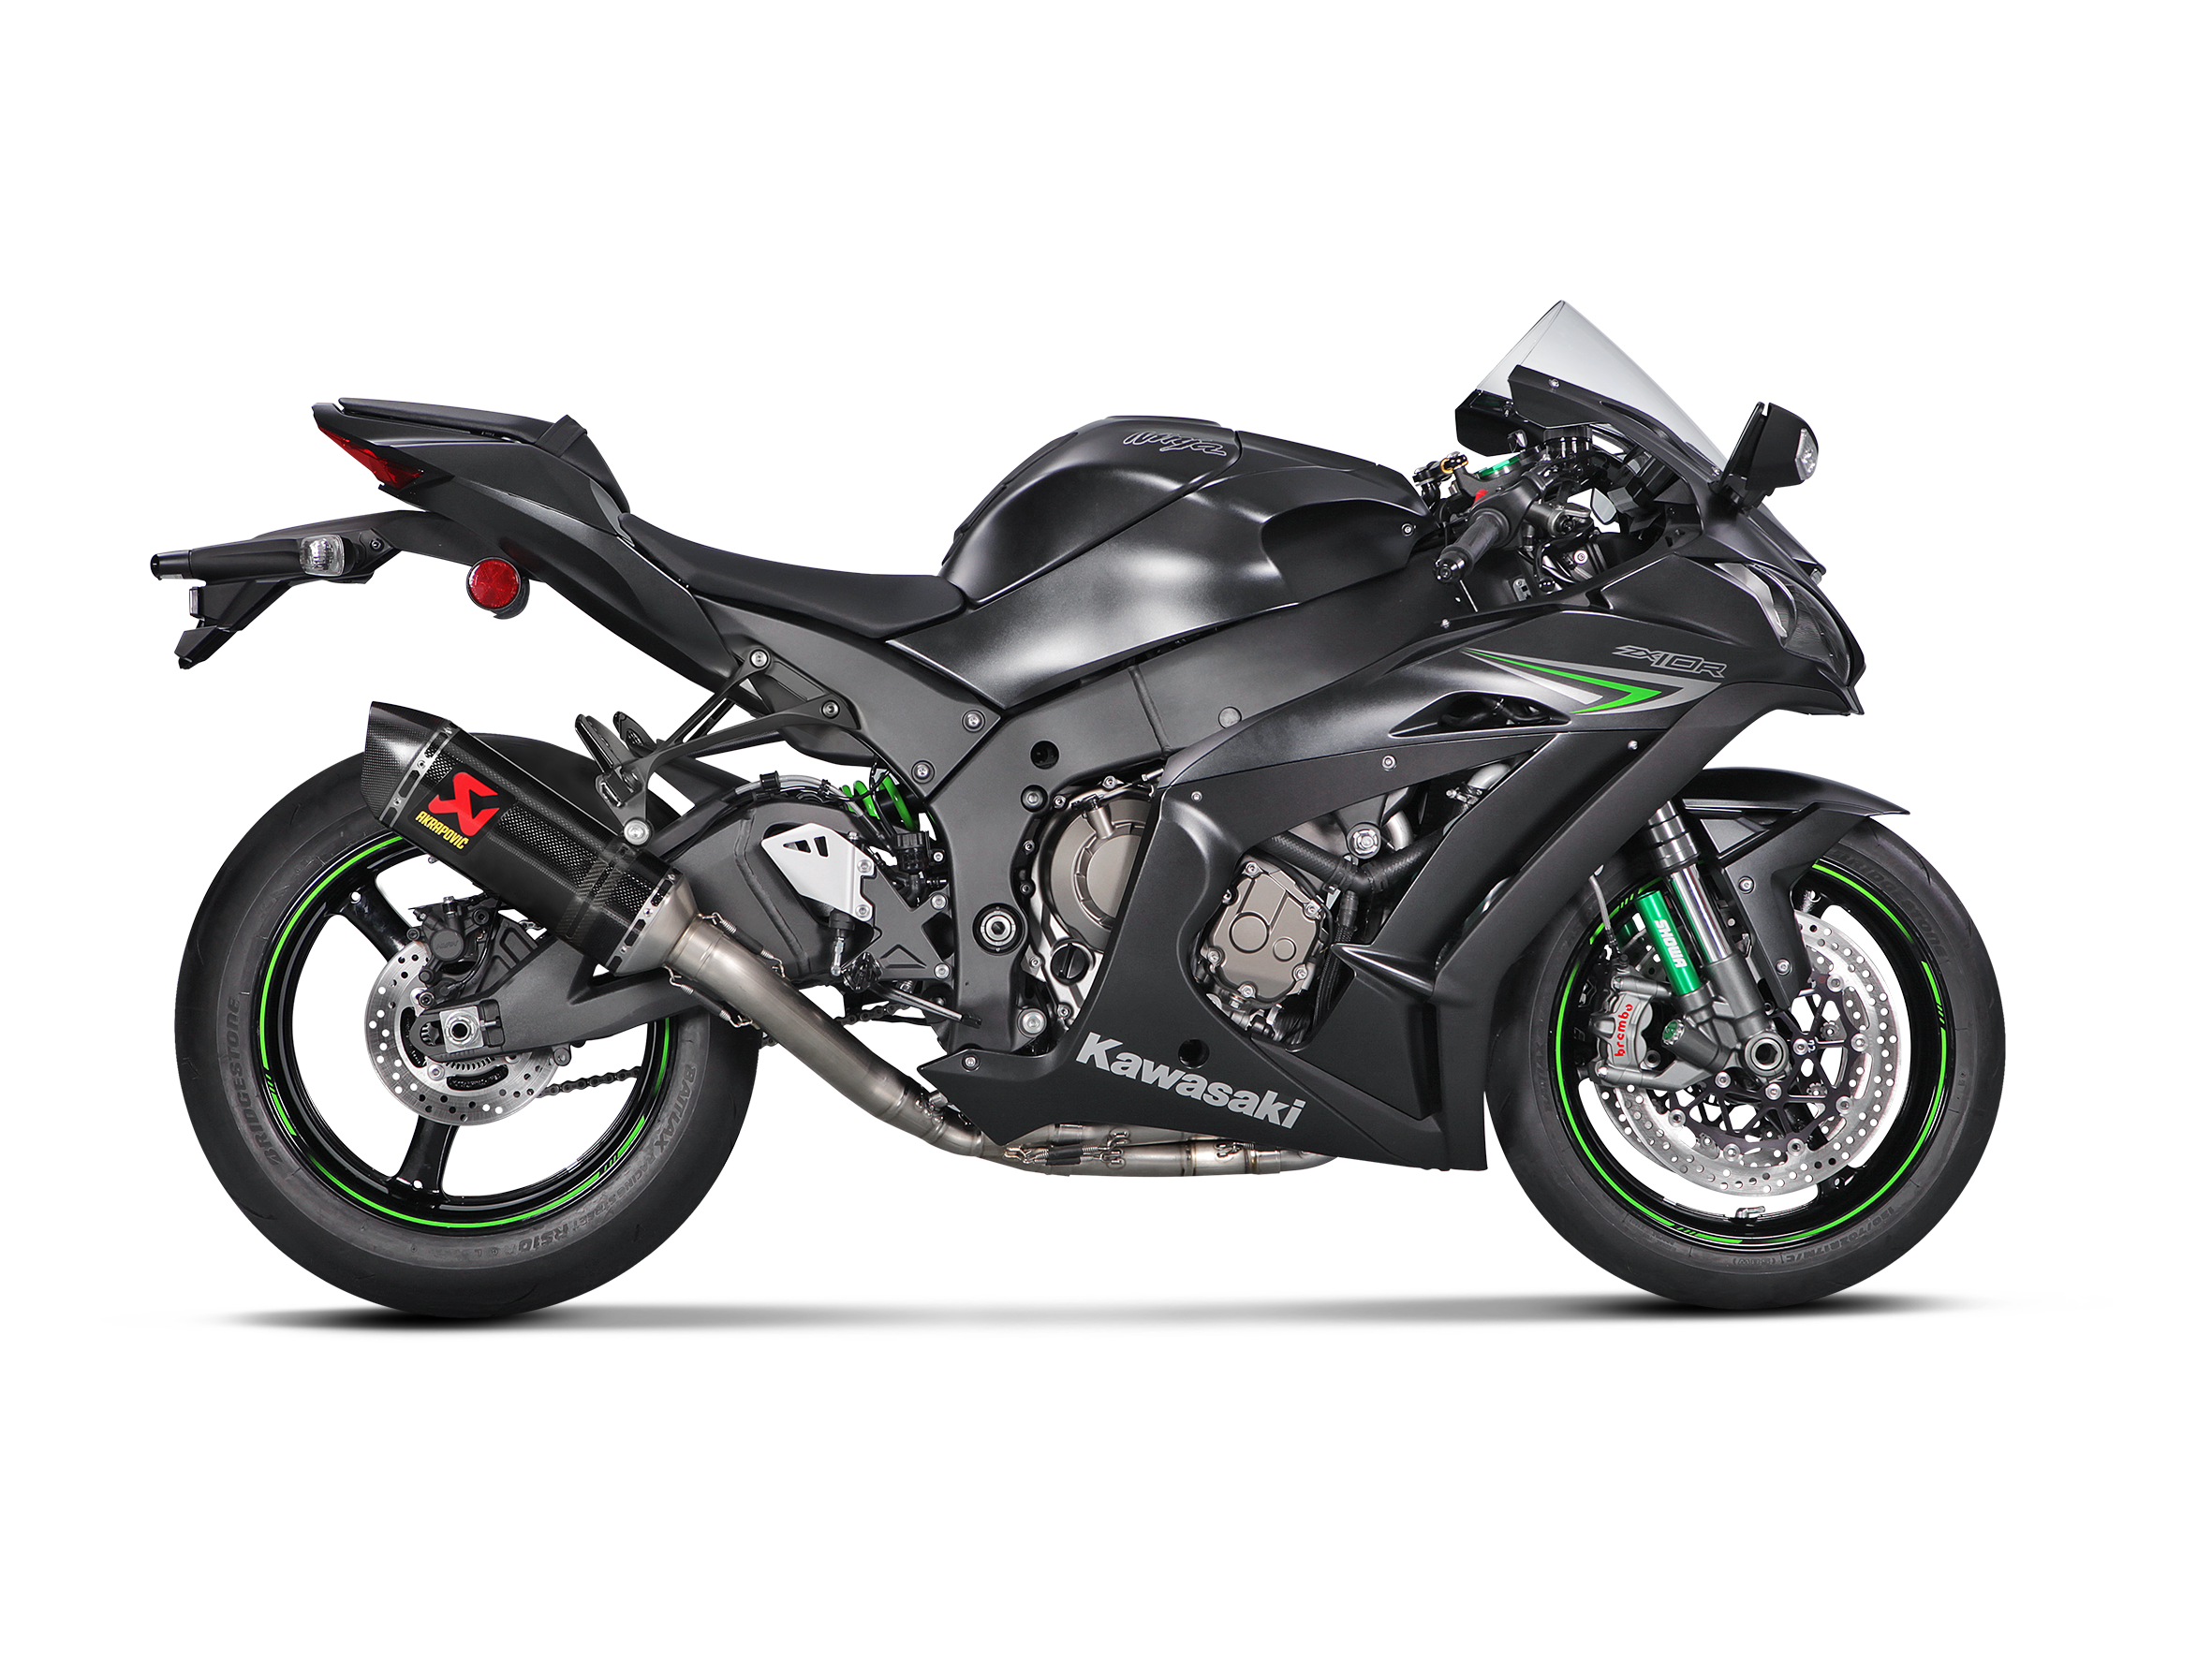 Kawasaki Ninja Zx 10r 2020 Evolution Line Carbon Akrapovic Motorcycle Exhaust